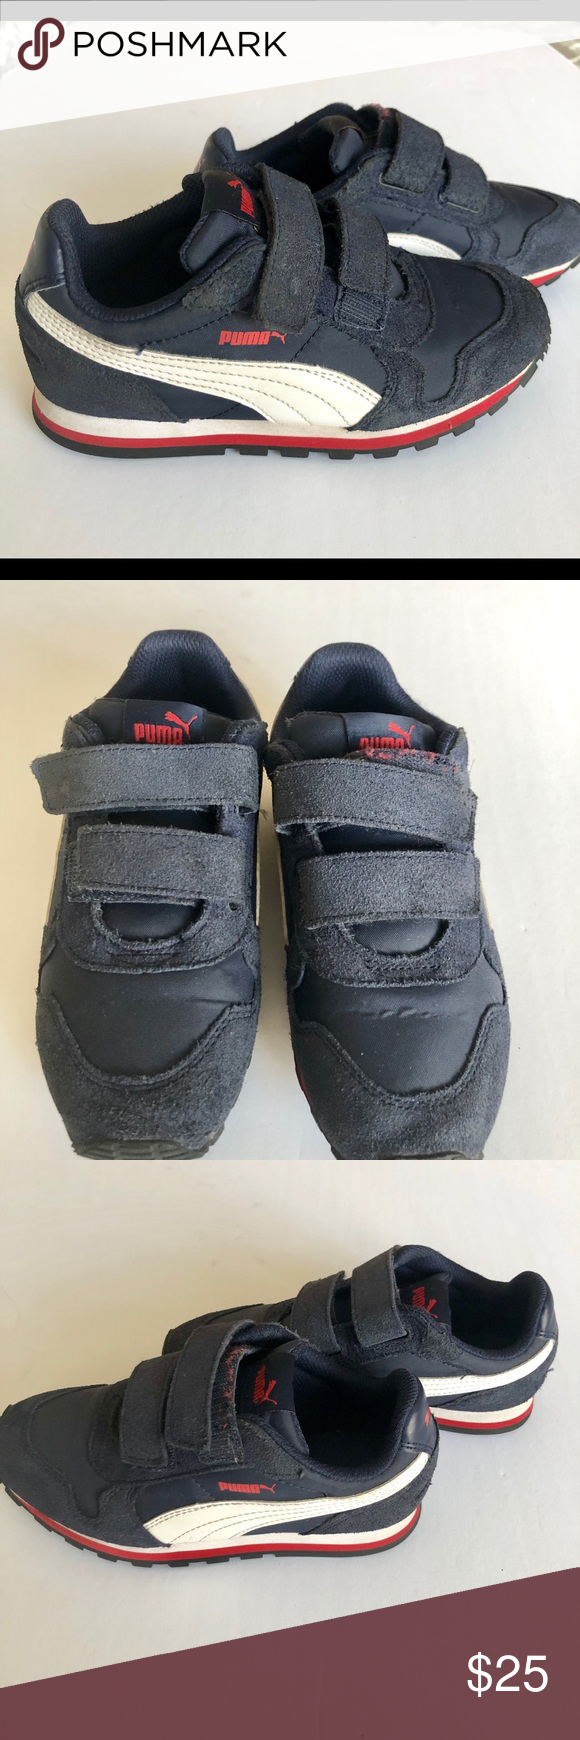 PUMA Little Boy Size 1 with Velcro